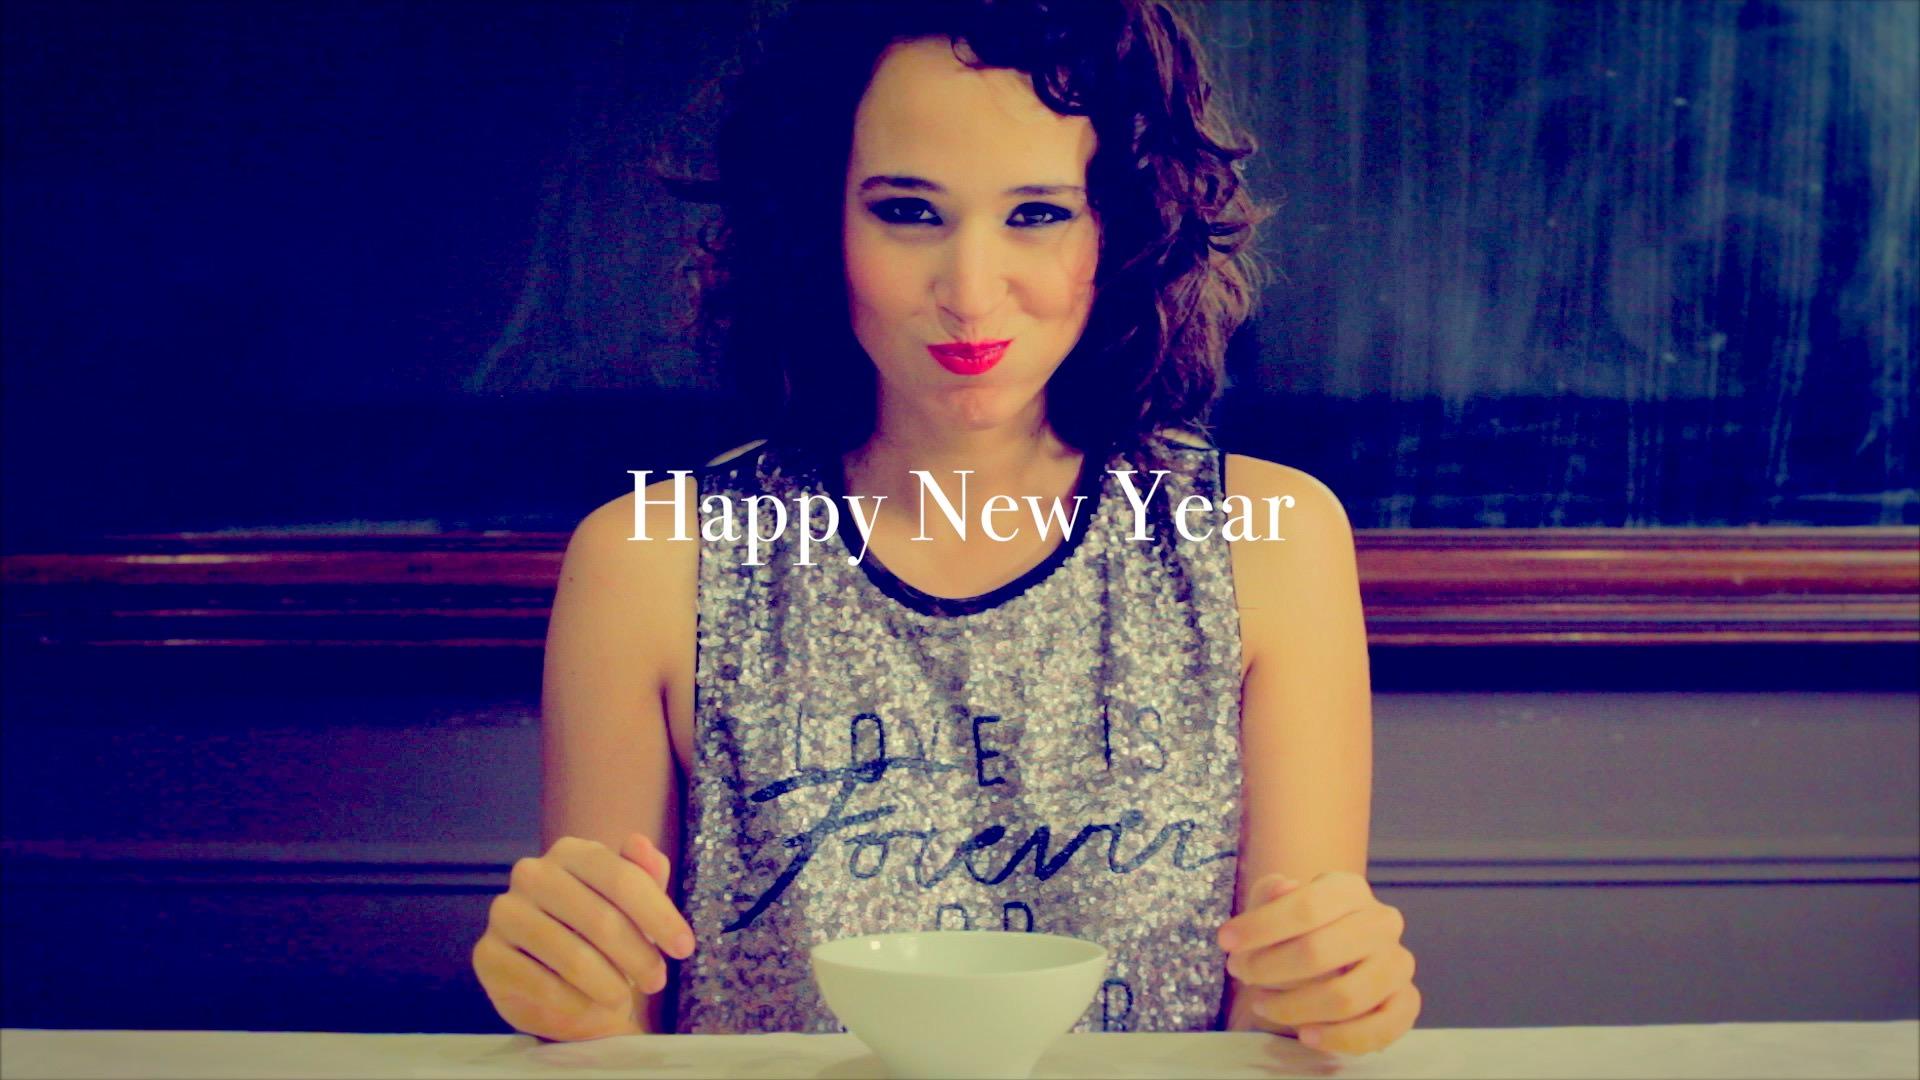 Fashion film to wish a Happy New Year